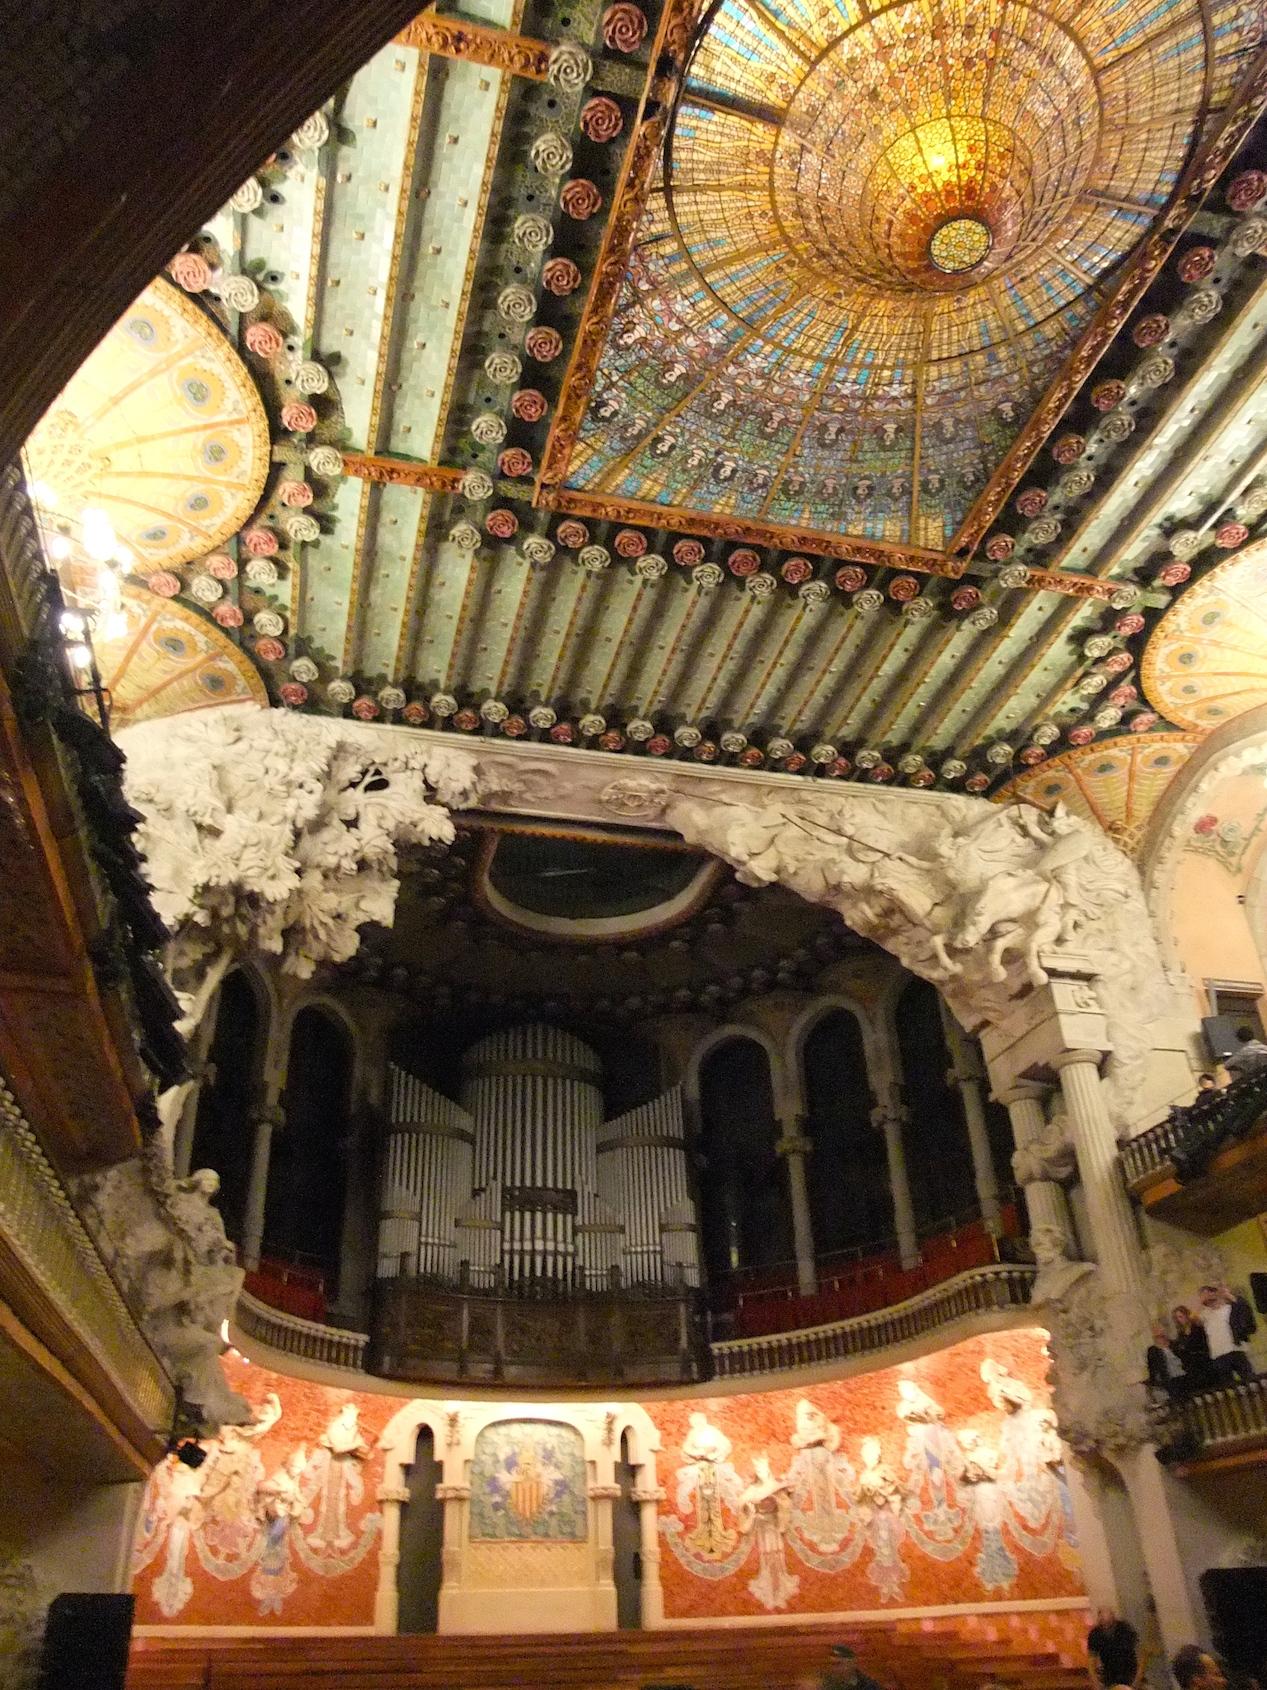 The stunning ceiling inside the Palau de la Música